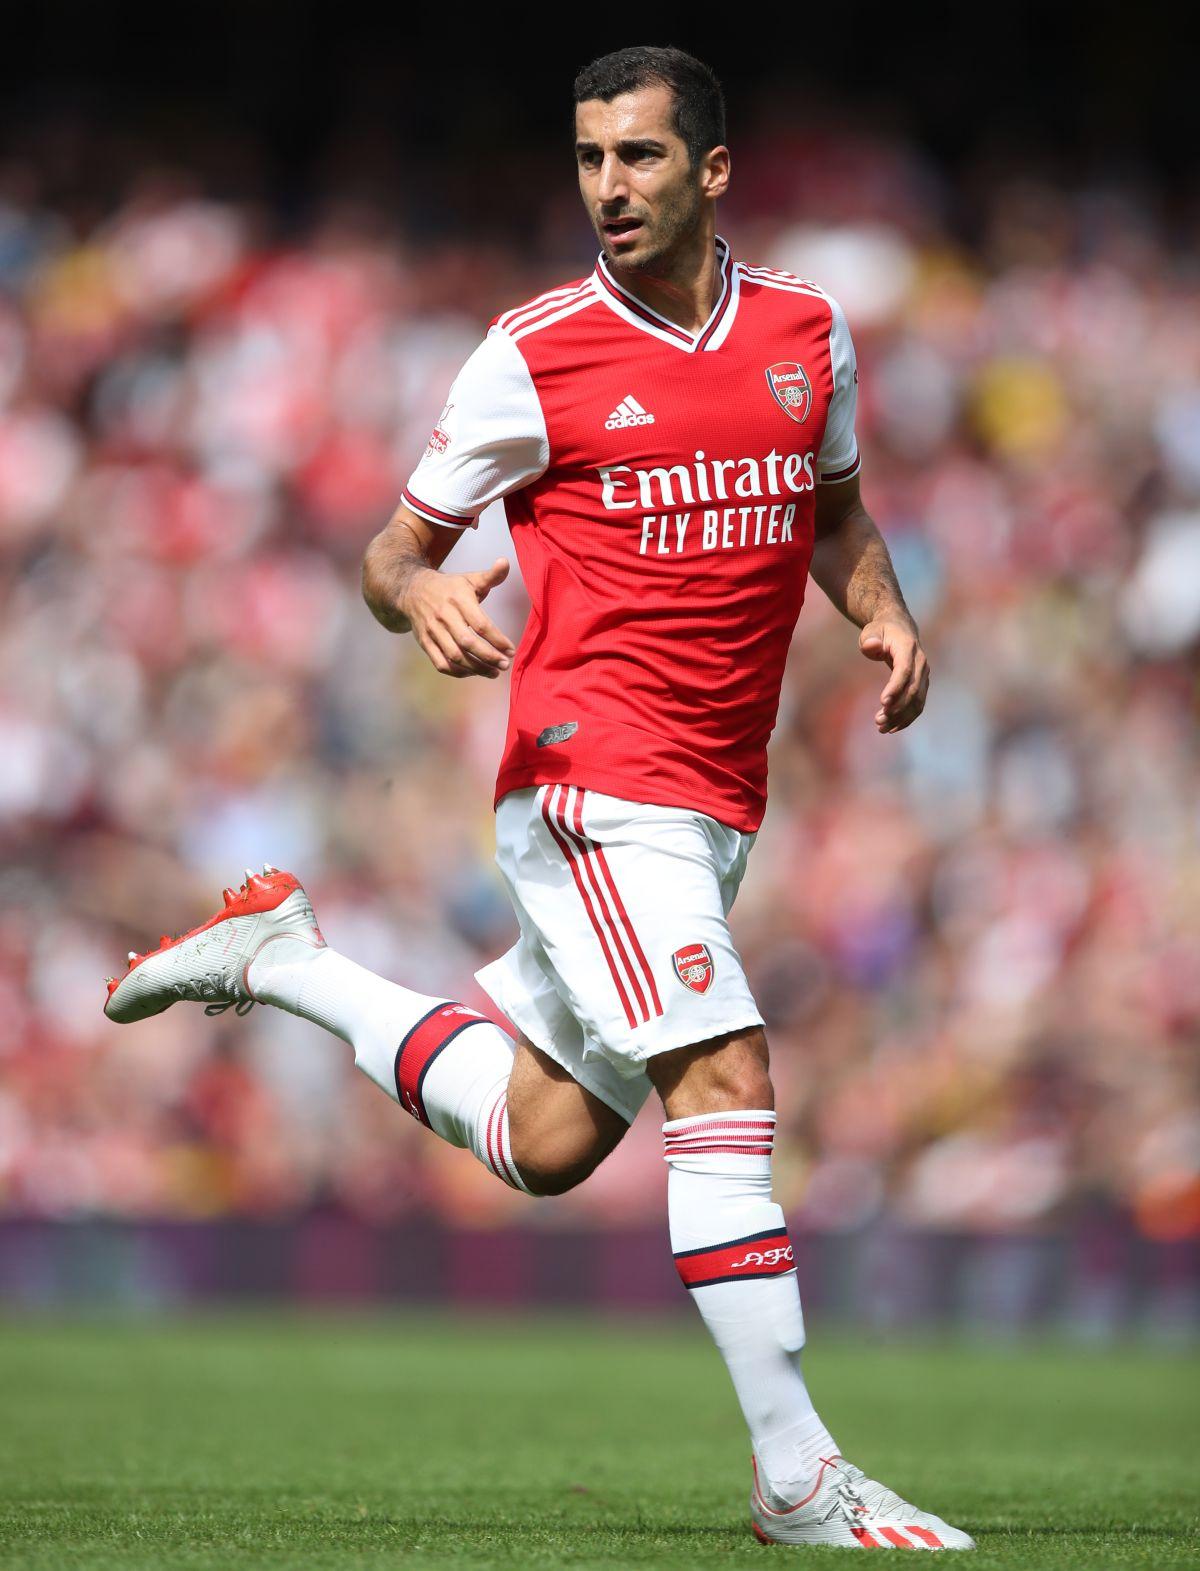 Arsenal midfielder Henrikh Mkhitaryan to remain at Roma